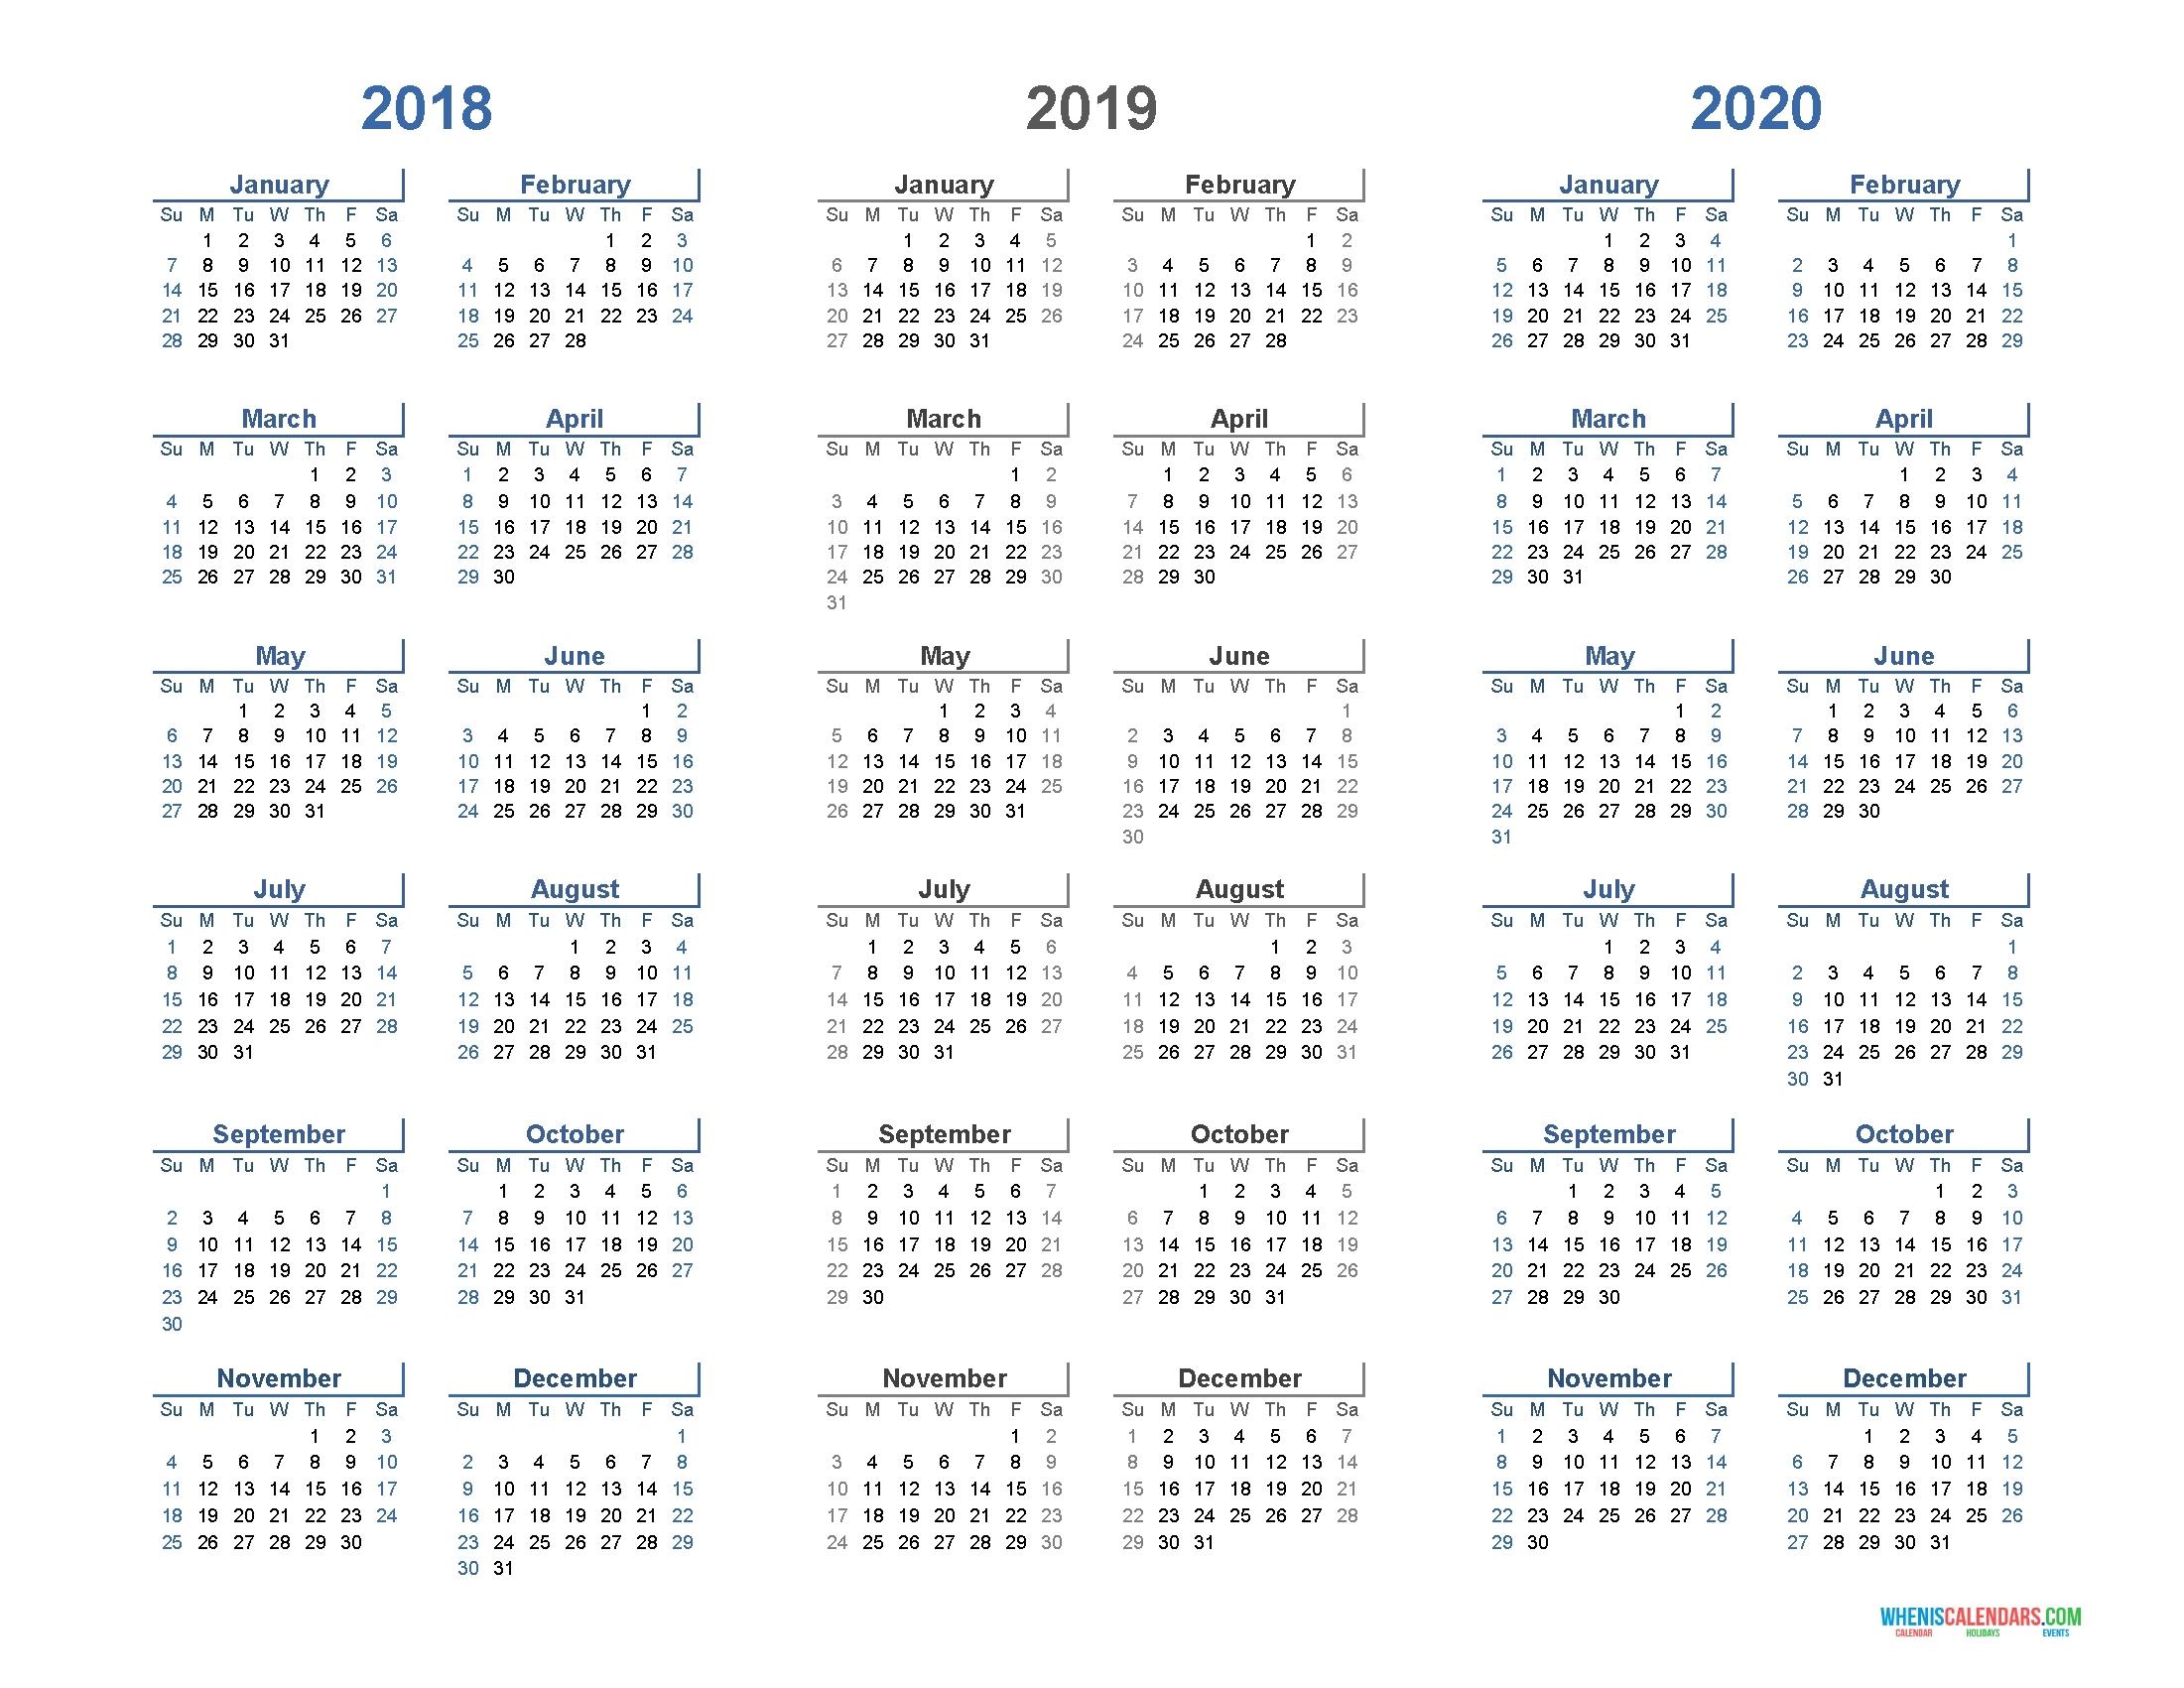 Extraordinary 3 Year Printable Calendar 2019 To 2020 • Printable Impressive 3 Year Calendar 2020